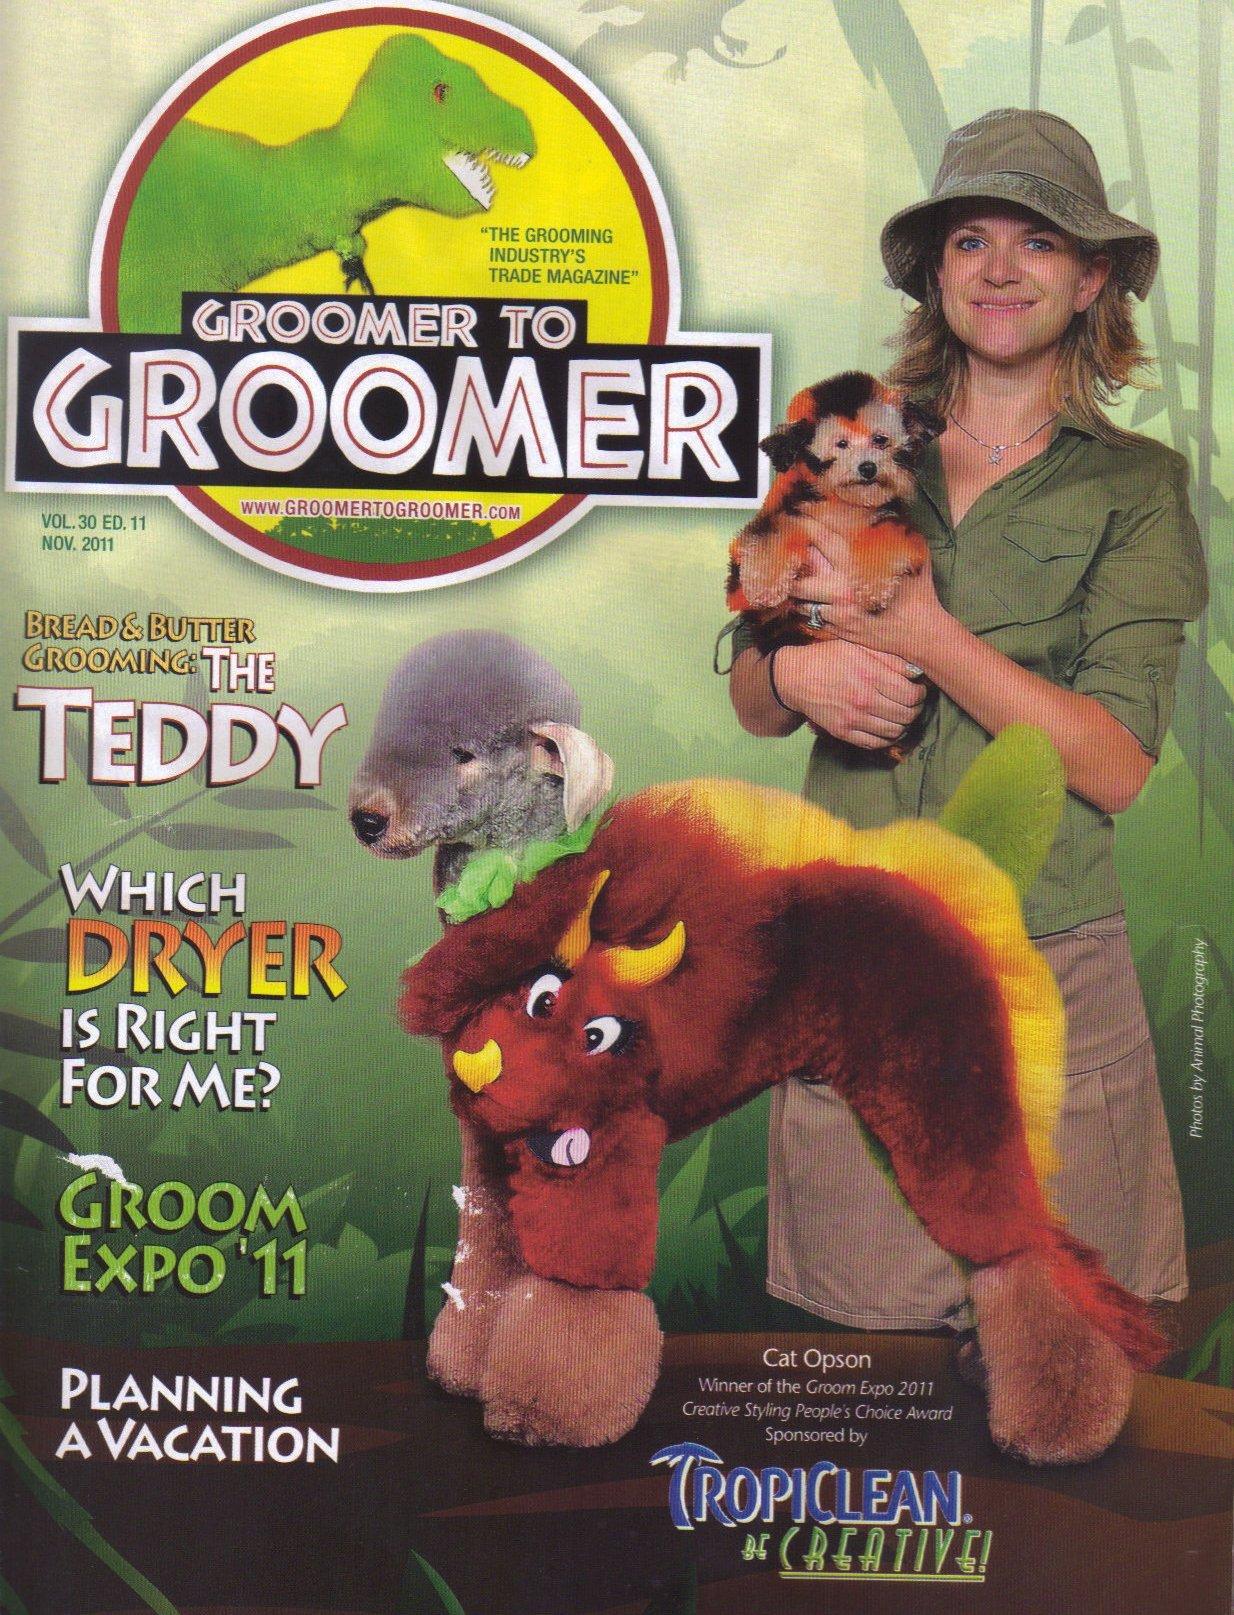 Dog groomer creepy - Jurassic Park cosplay